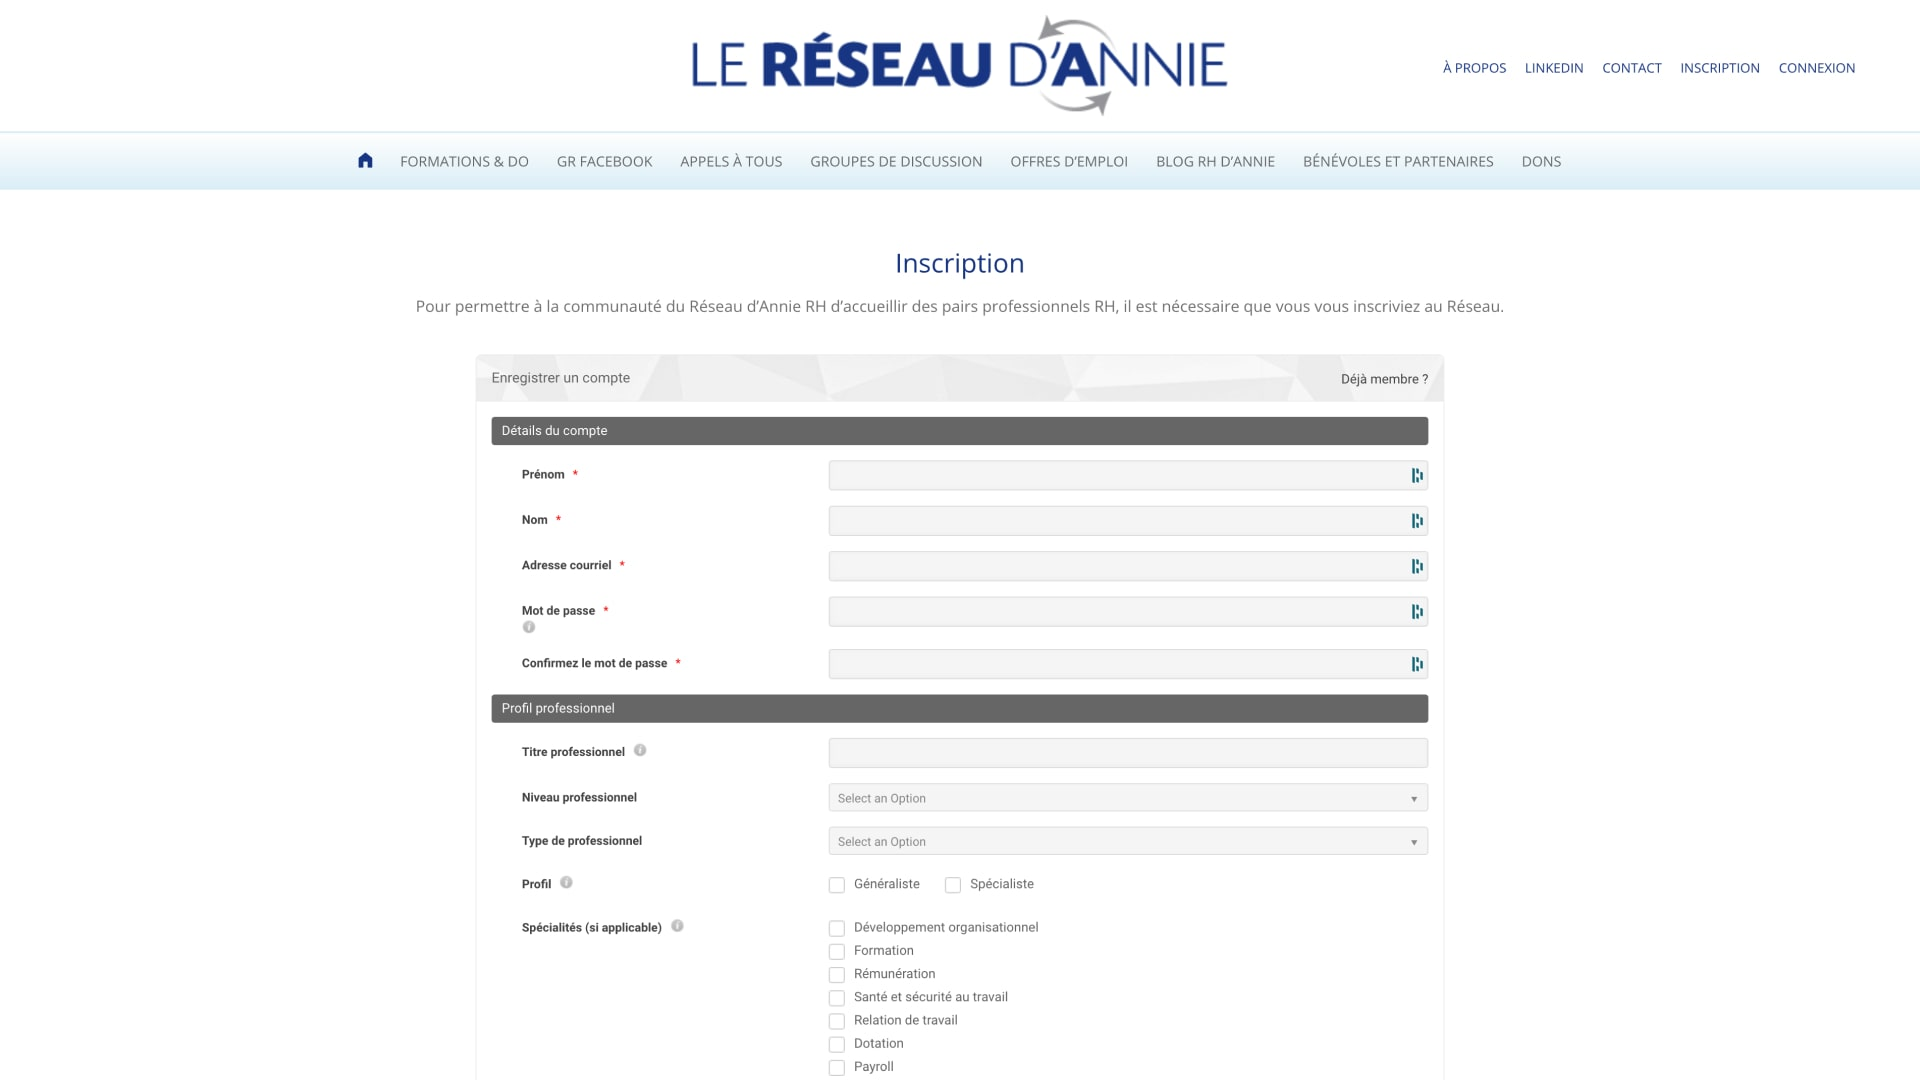 Reseau-Annie-Inscription-Sidney-Malgras-UX-UI-Designer